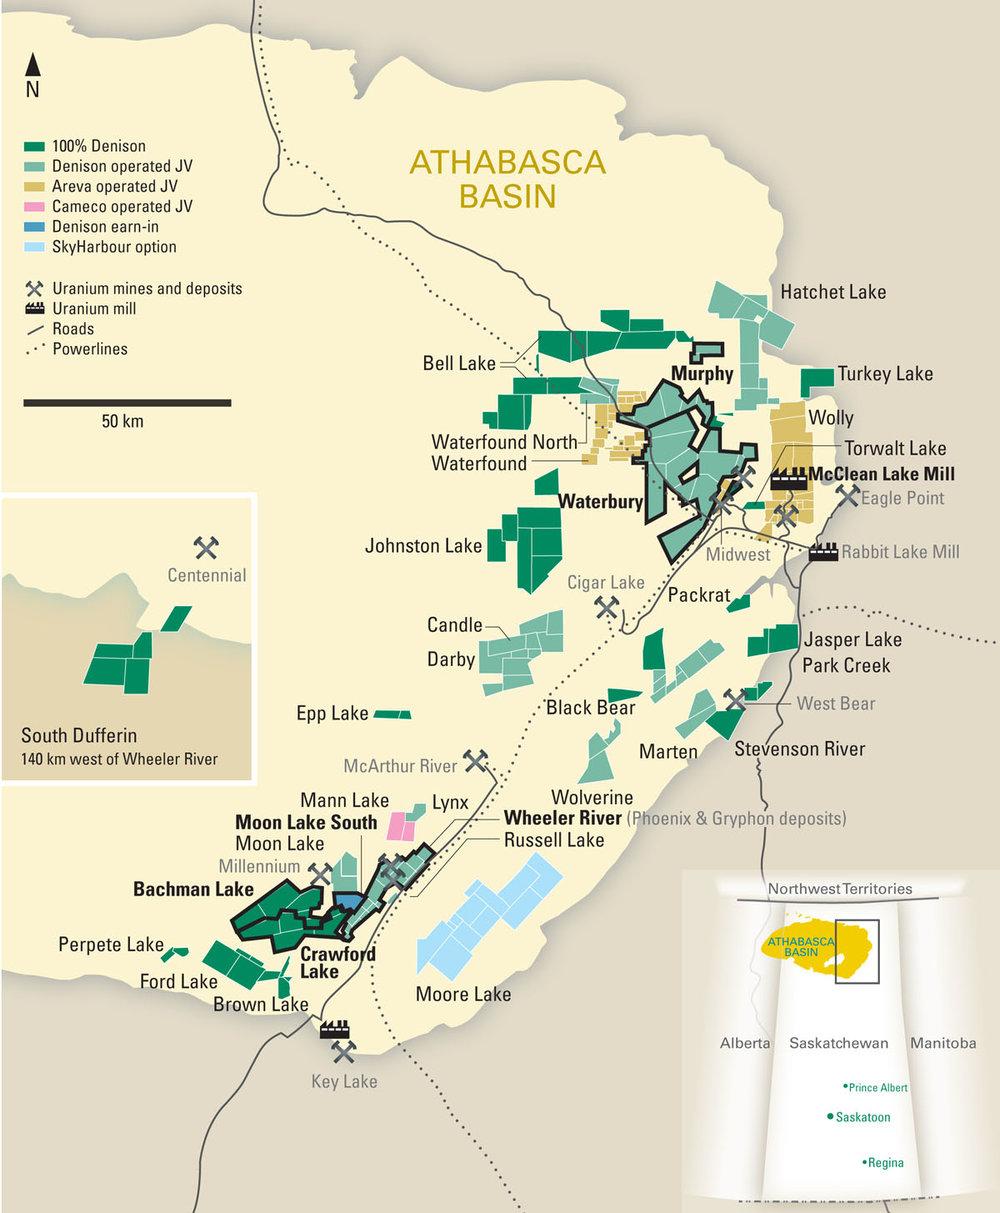 Denison Athabasca Basin.jpg